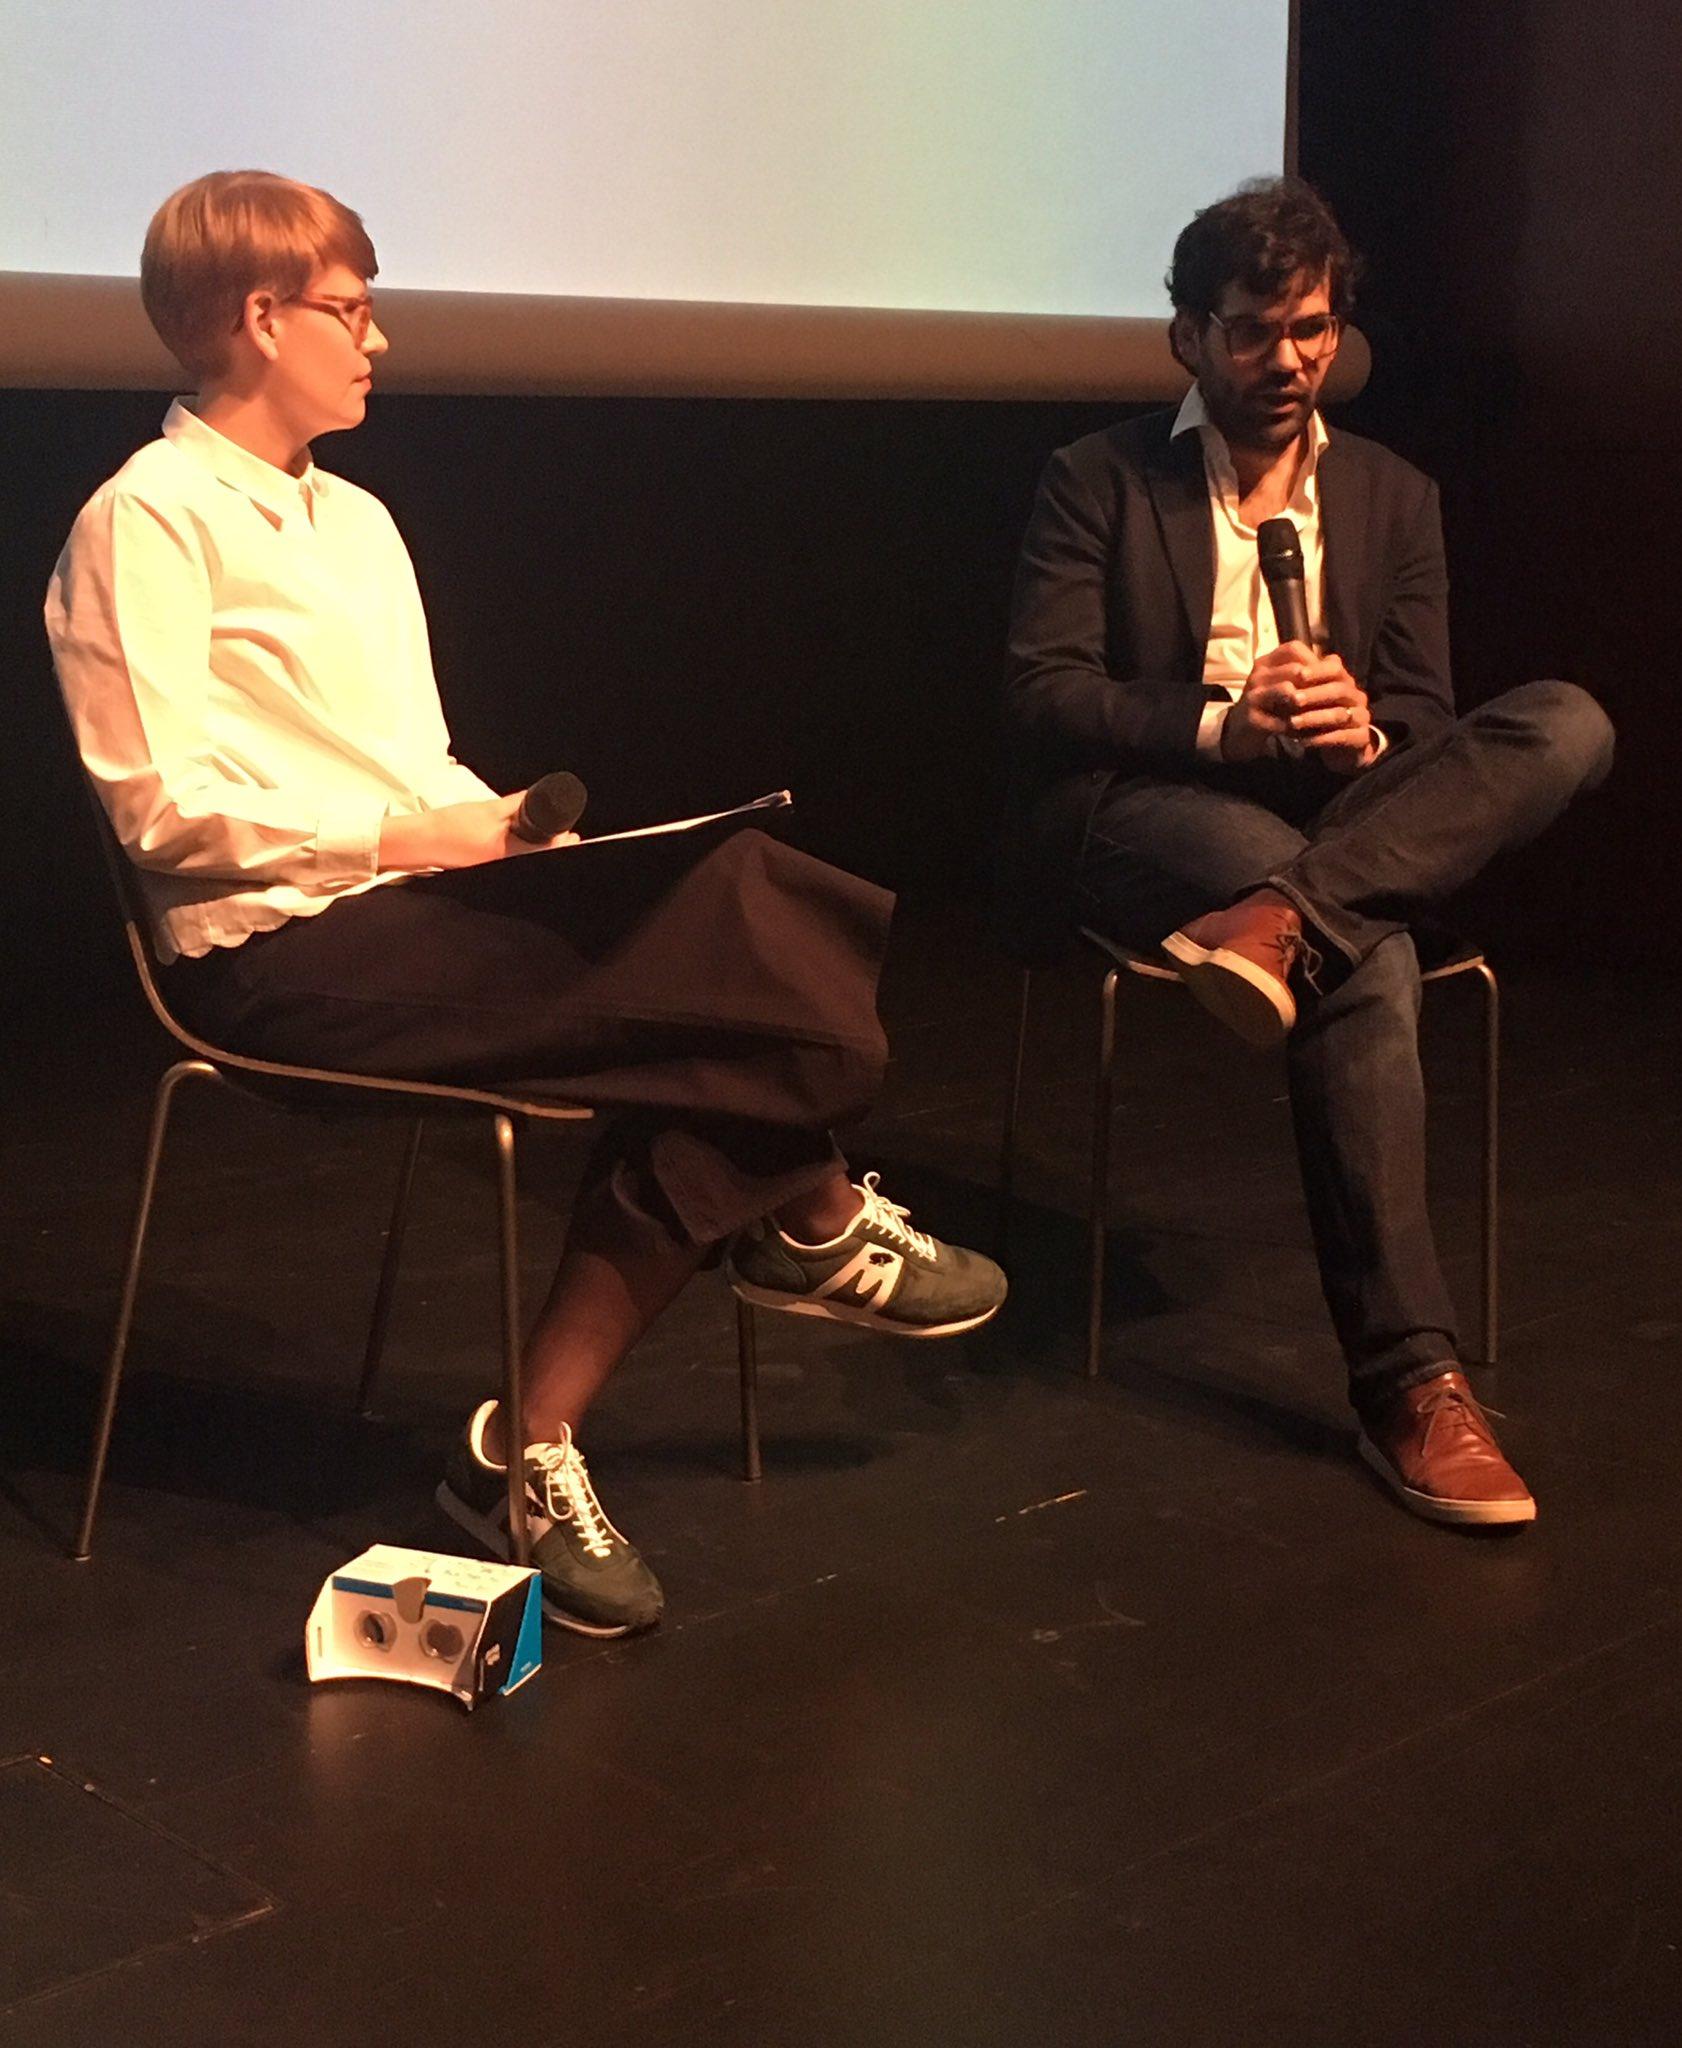 Milja Liimatainen interviews @axelote at #Kiasmatheatre about Straschnoy's #VR work #TheDetective #arsplus #ARS17 @KiasmaMuseum https://t.co/4YhMUmJNRn